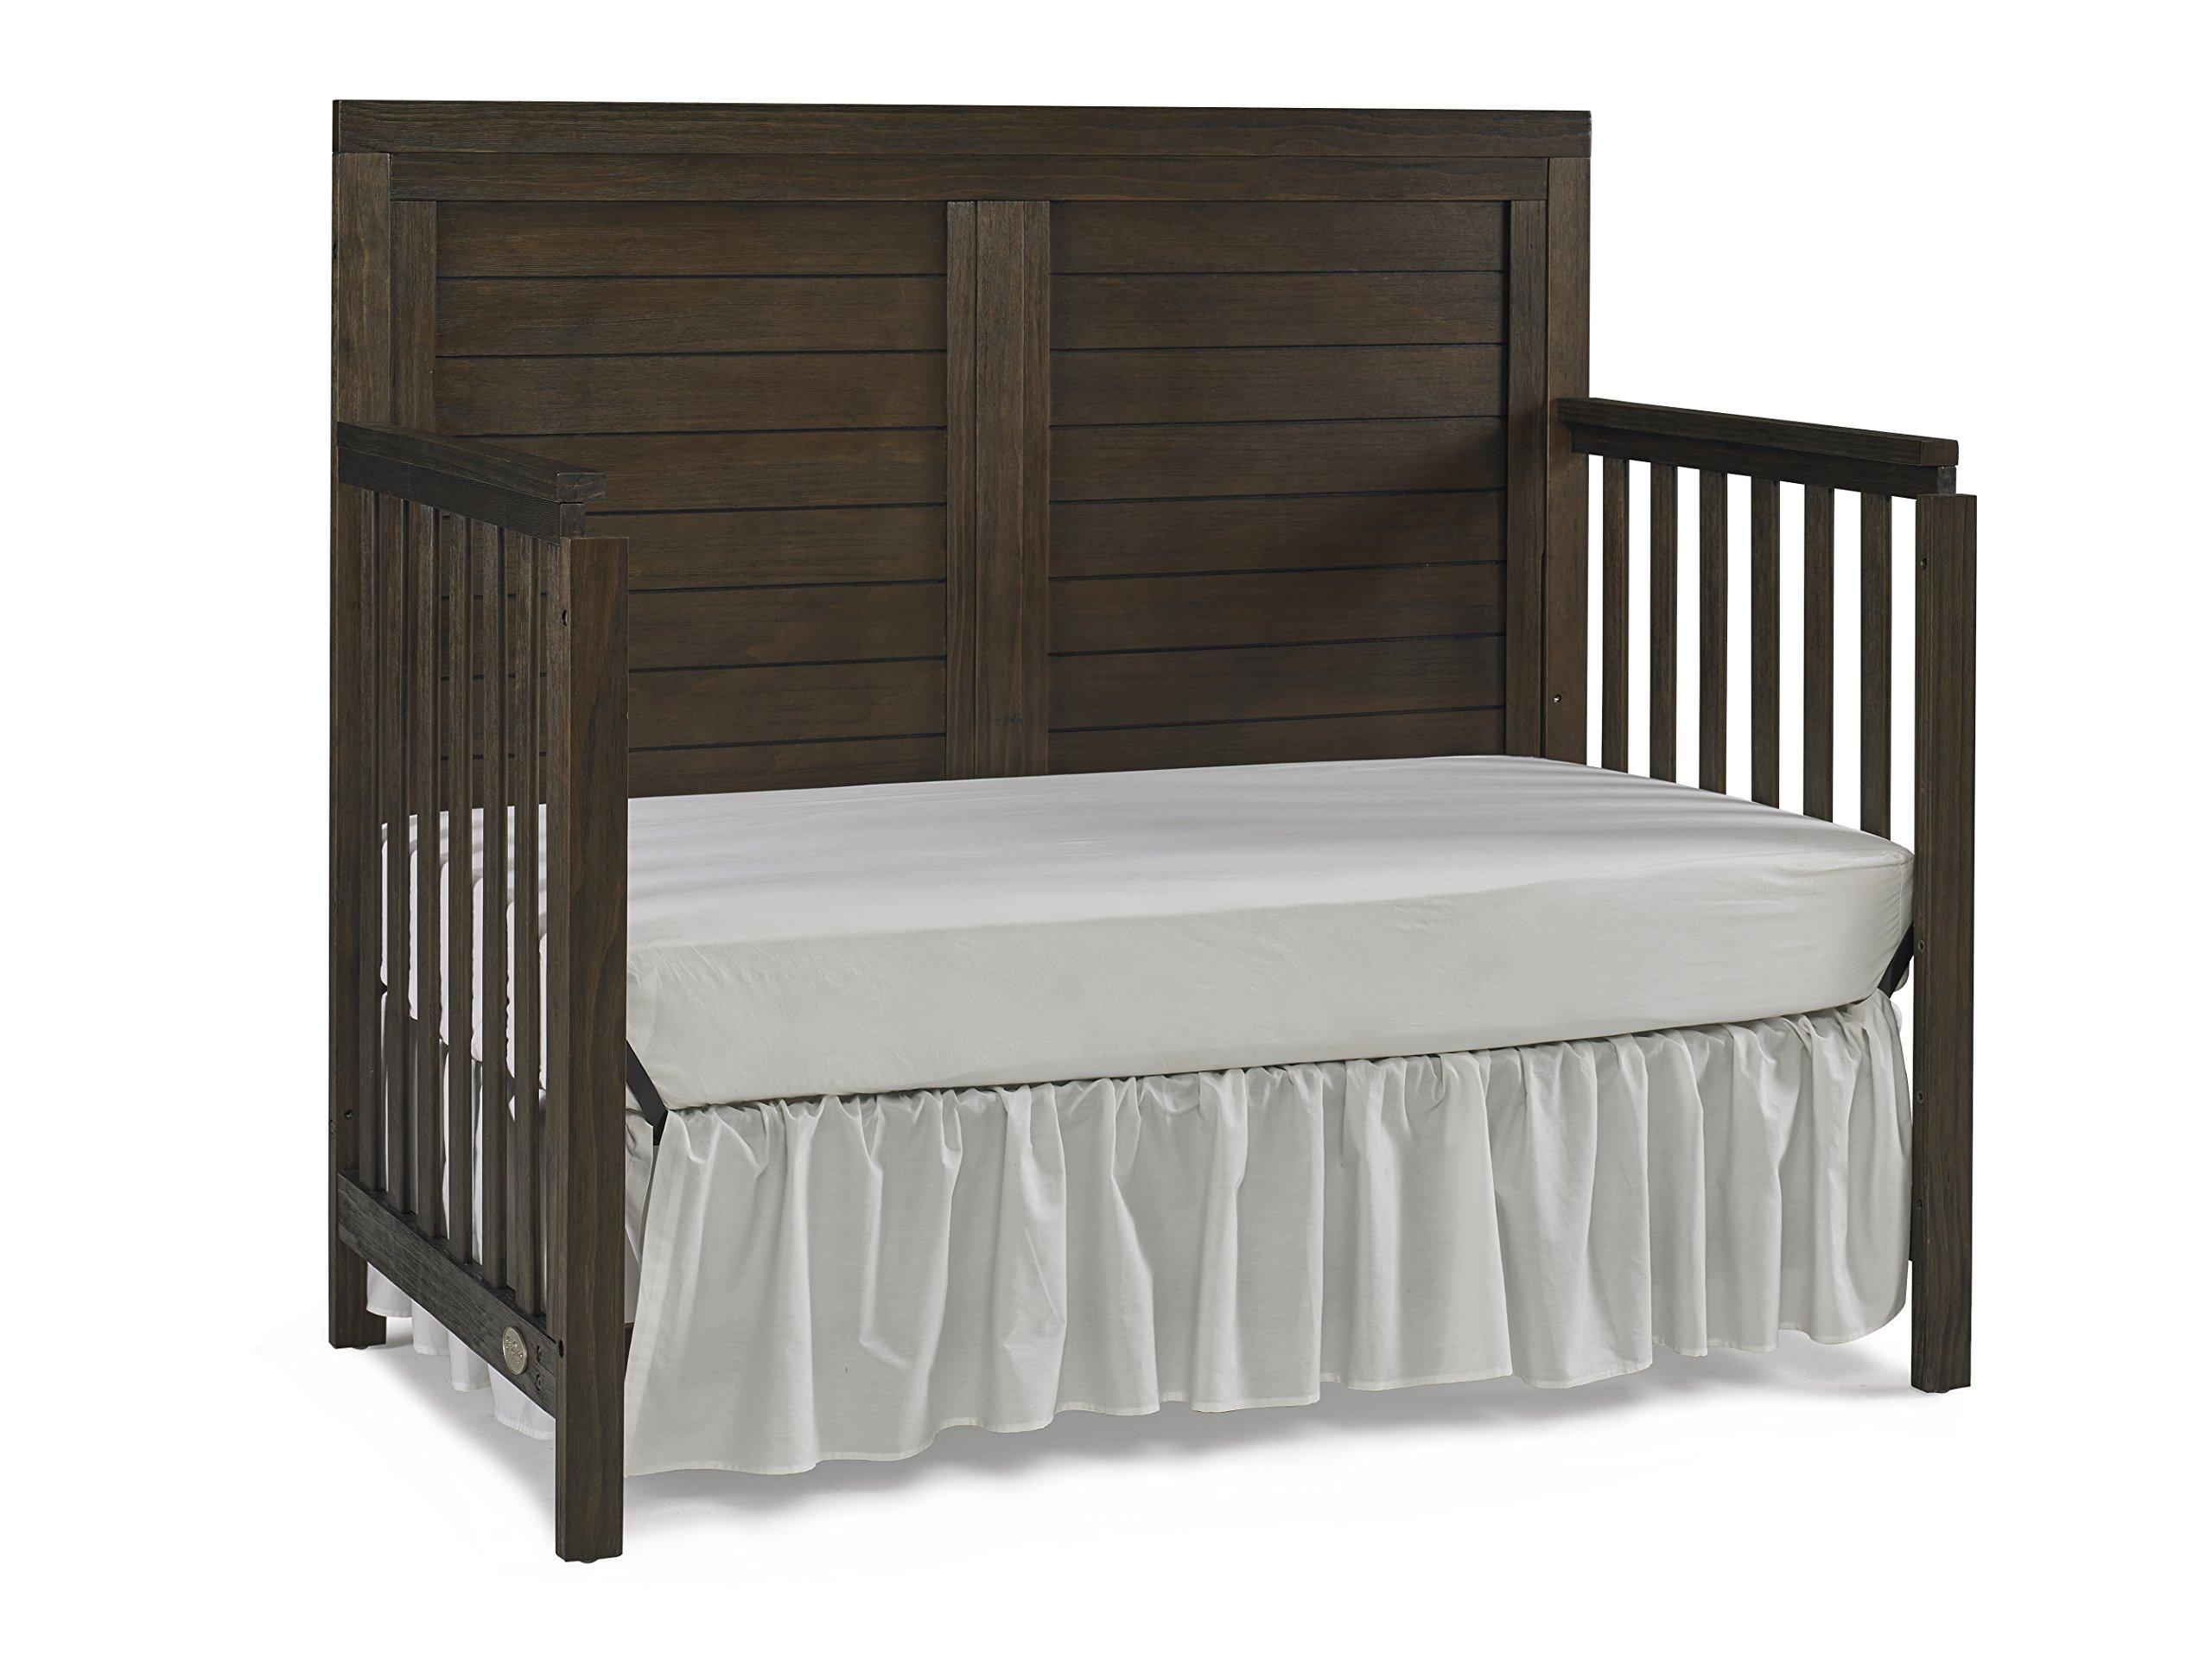 Ti Amo Castello 4 in 1 Convertible Crib, Wire Brushed Brown by Tiamo (Image #7)